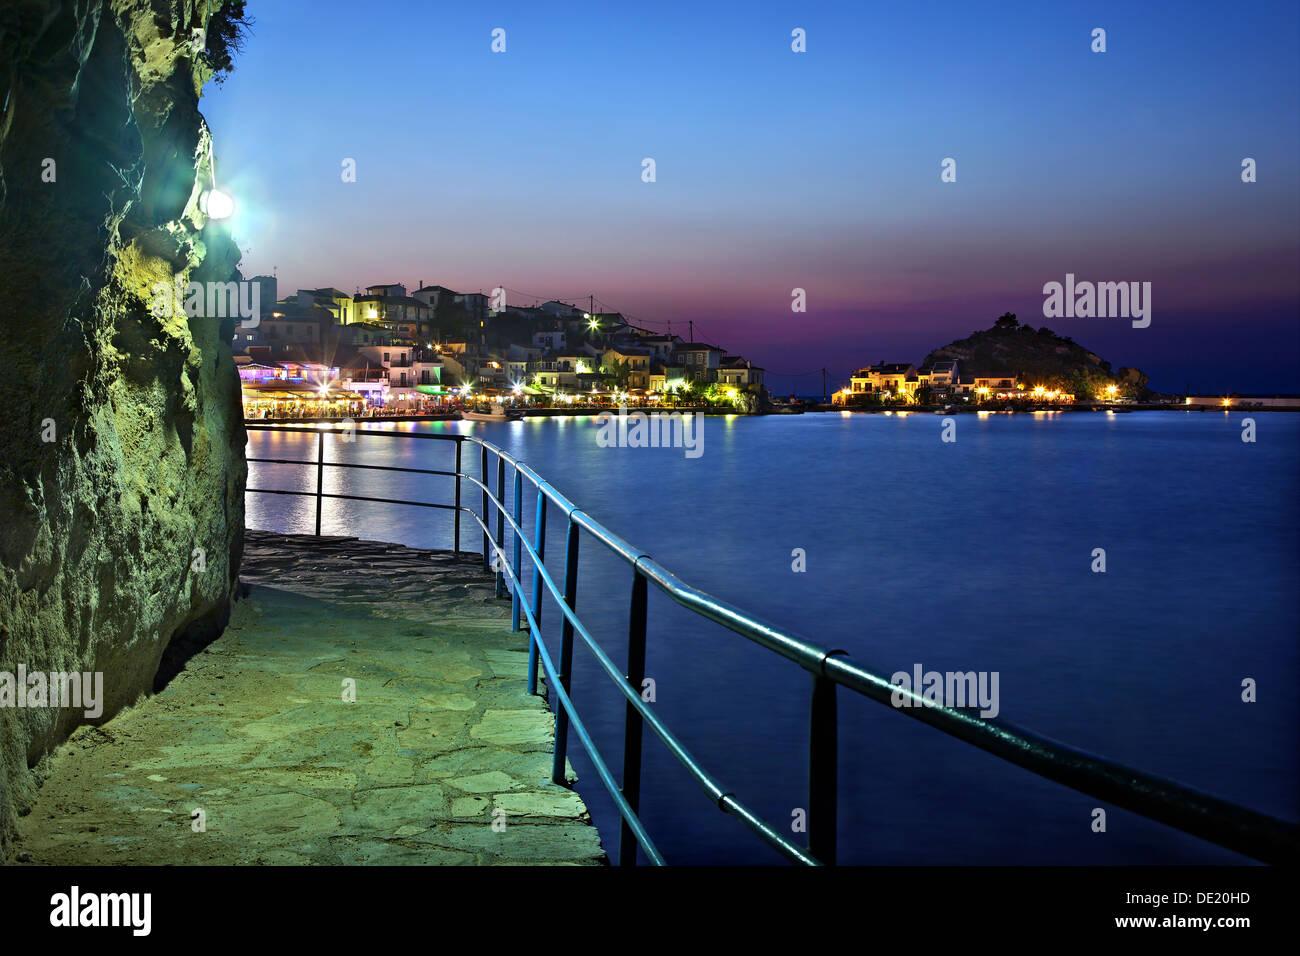 Night view of Kokkari village, one of the most popular tourist destinations in Samos island, Greece. - Stock Image